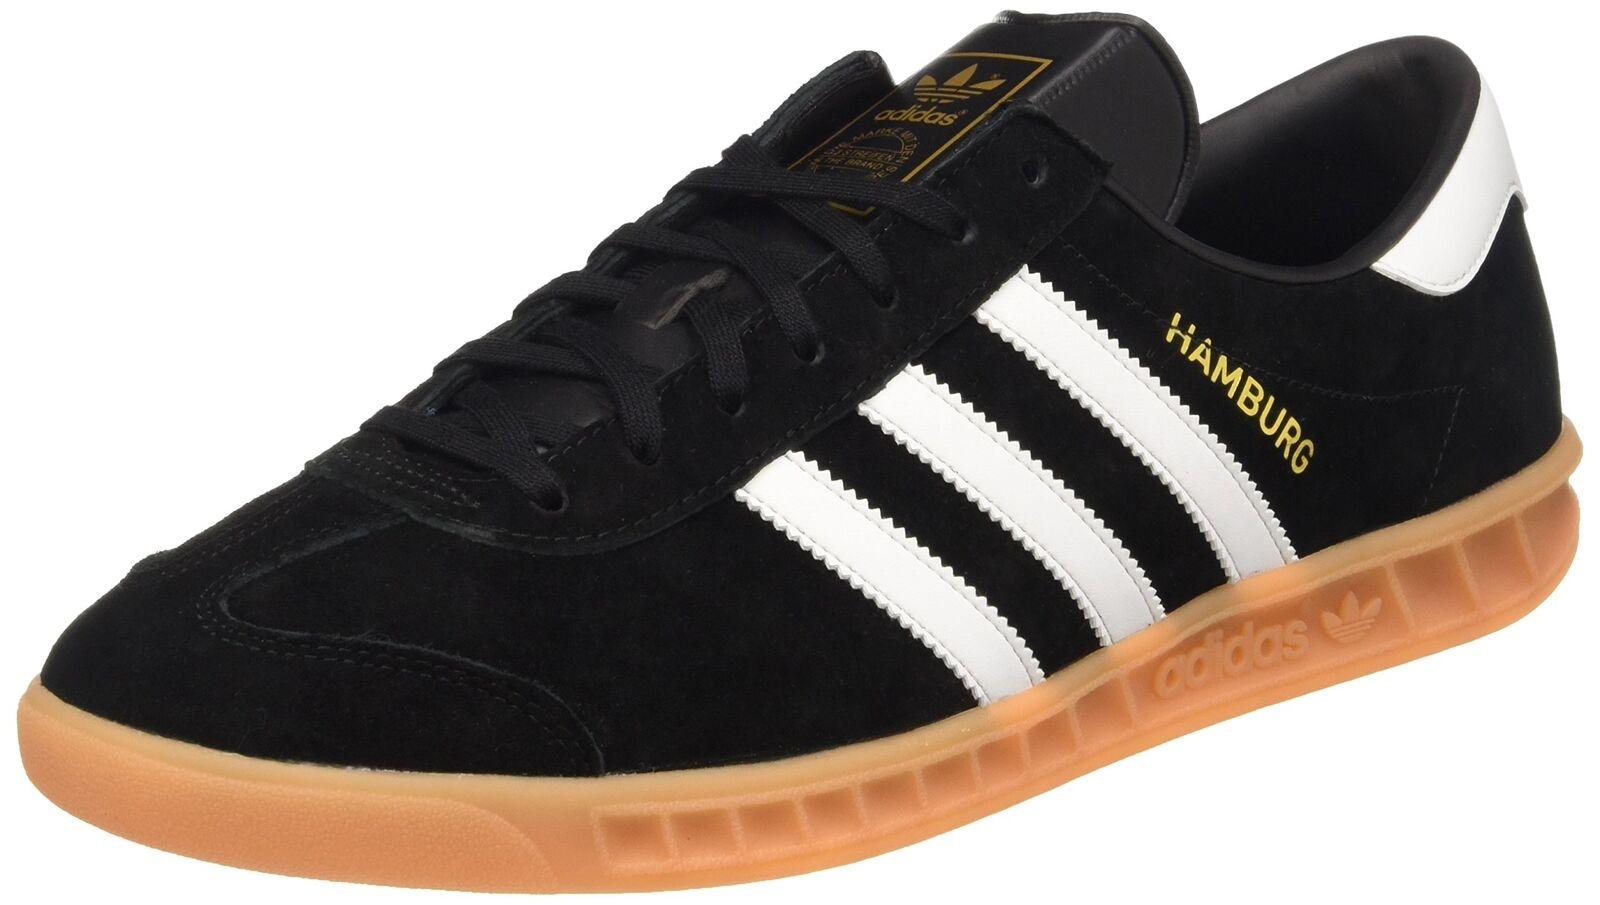 adidas Originals Black Hamburg Mens Sneaker Black Originals S31602 size 5.5US 112c19